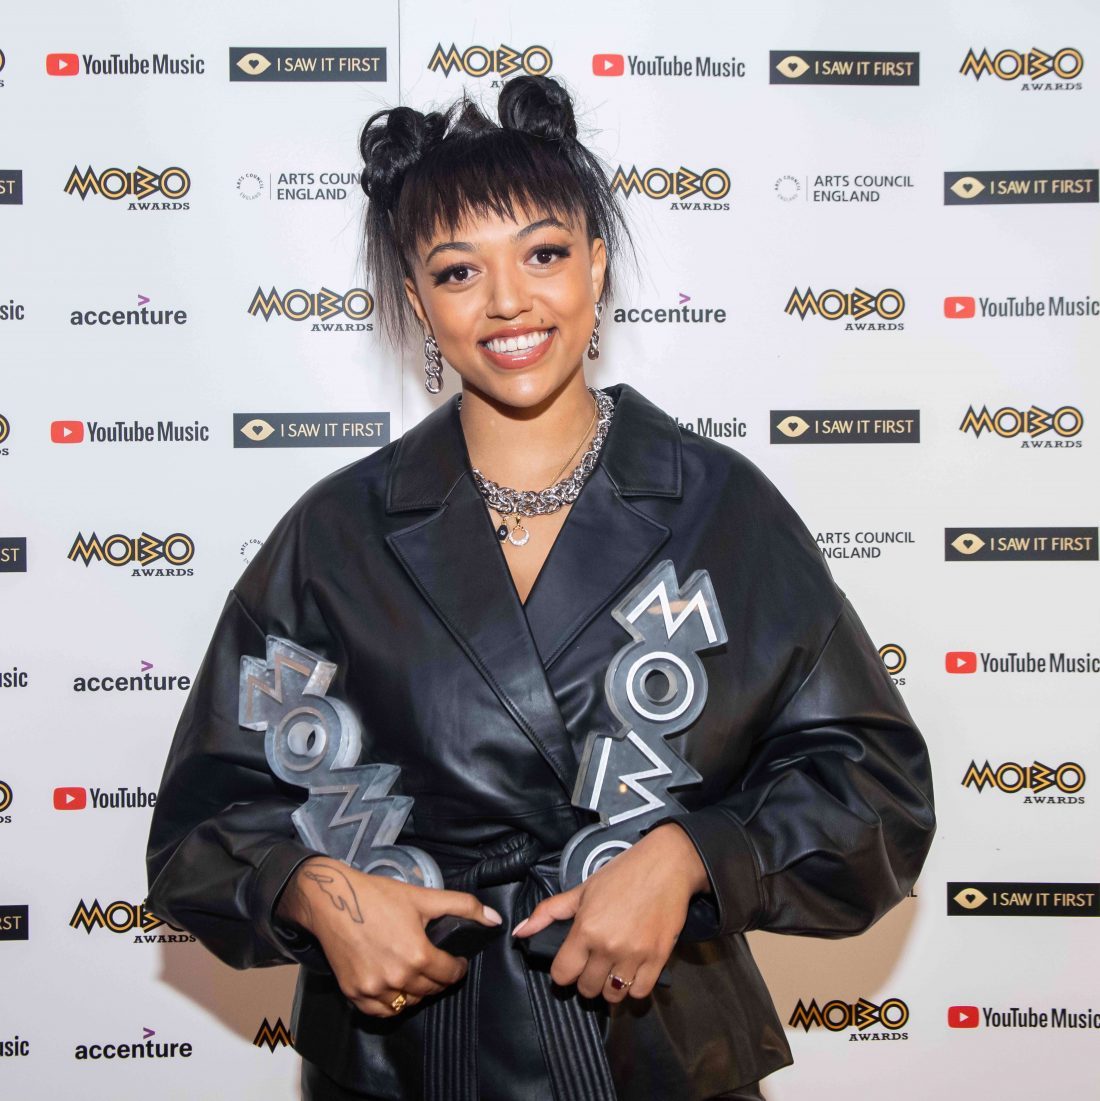 MOBO Awards 2020